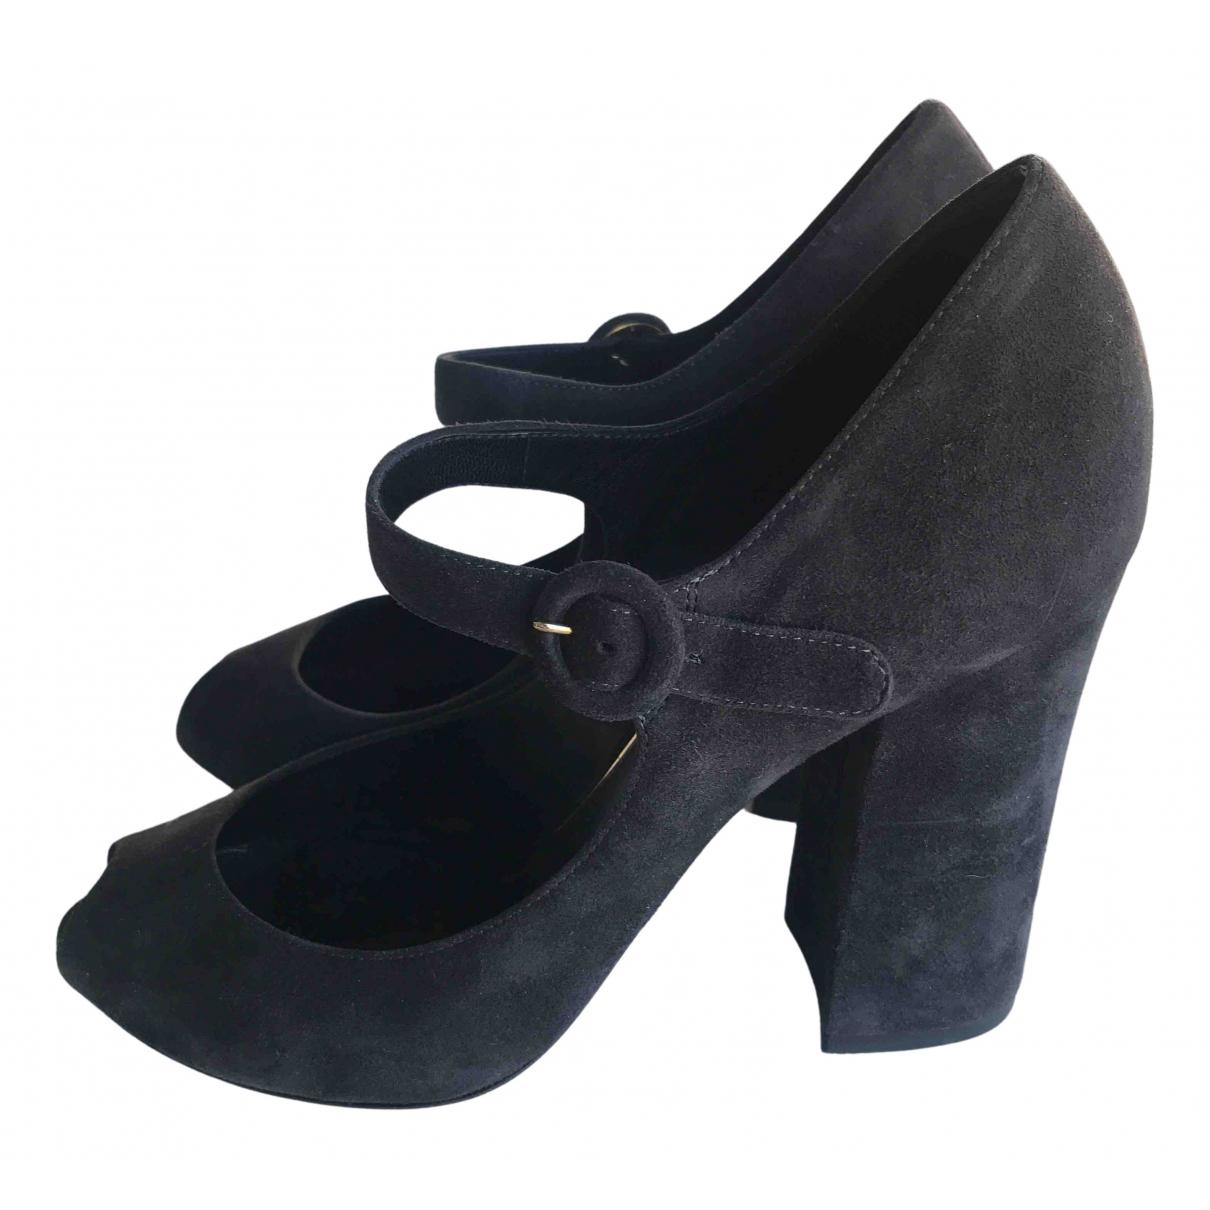 Dolce & Gabbana N Black Suede Heels for Women 39 EU